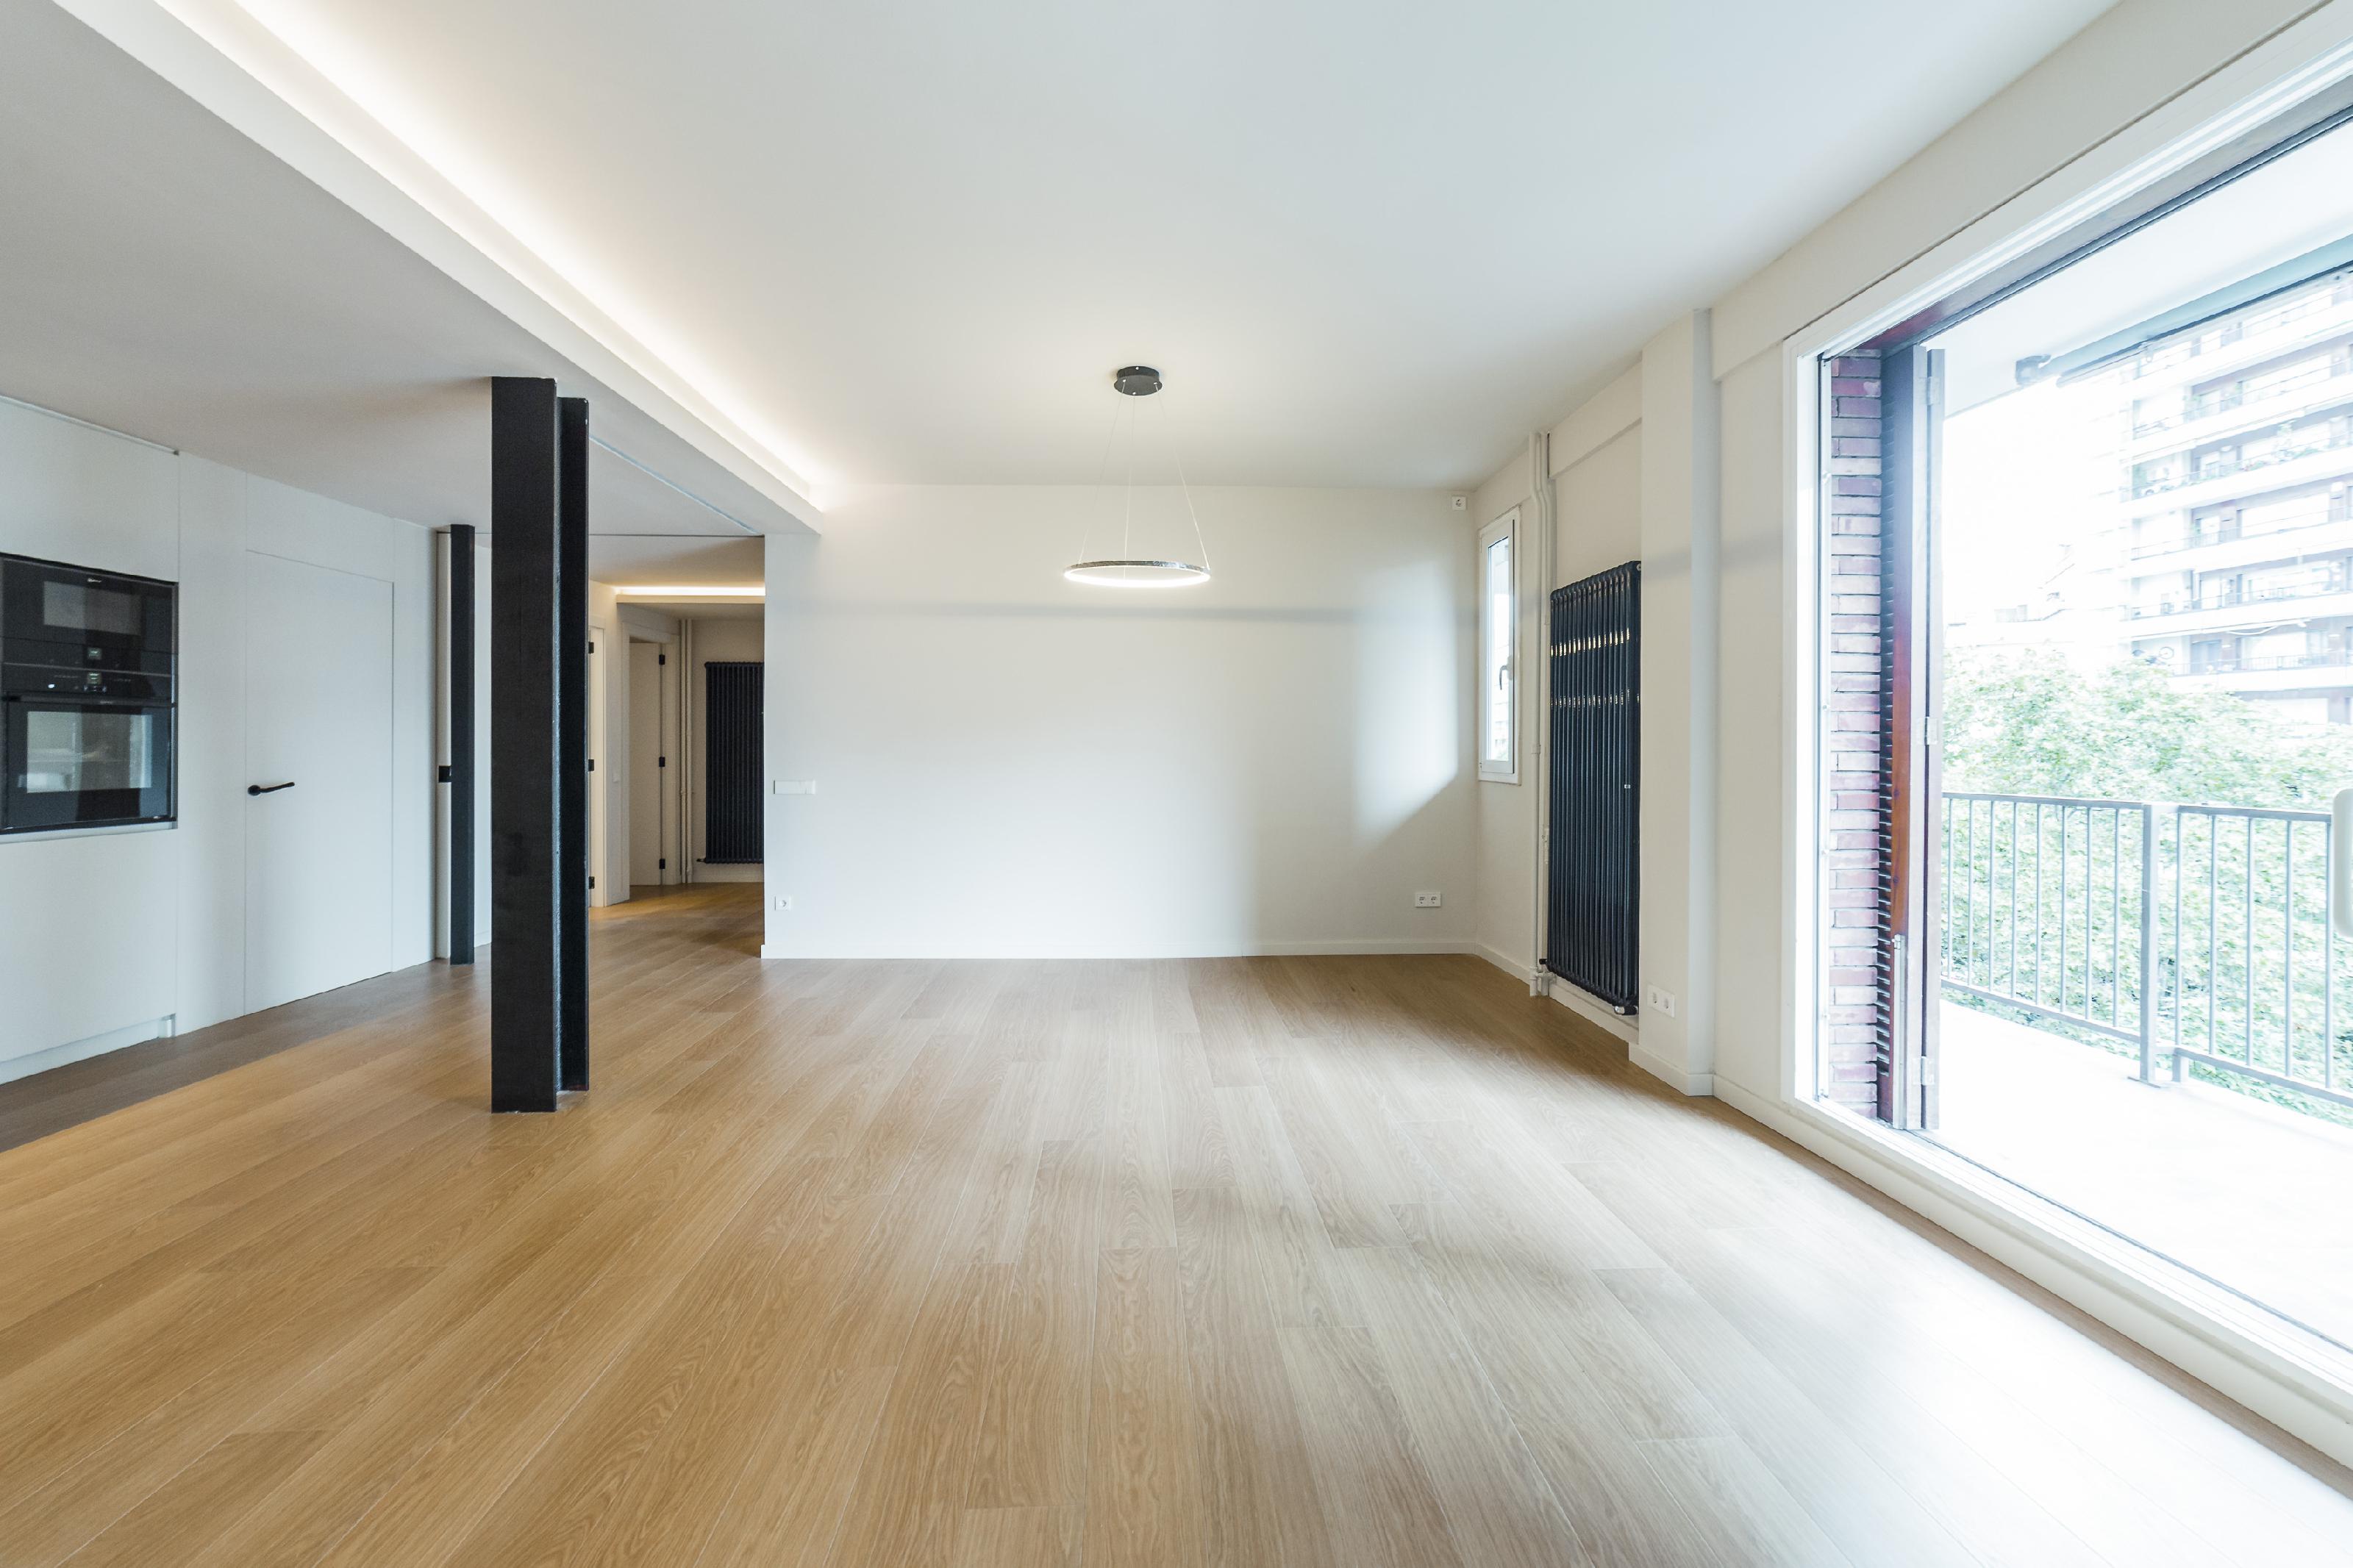 253492 Flat for sale in Sarrià-Sant Gervasi, Sant Gervasi-Galvany 13